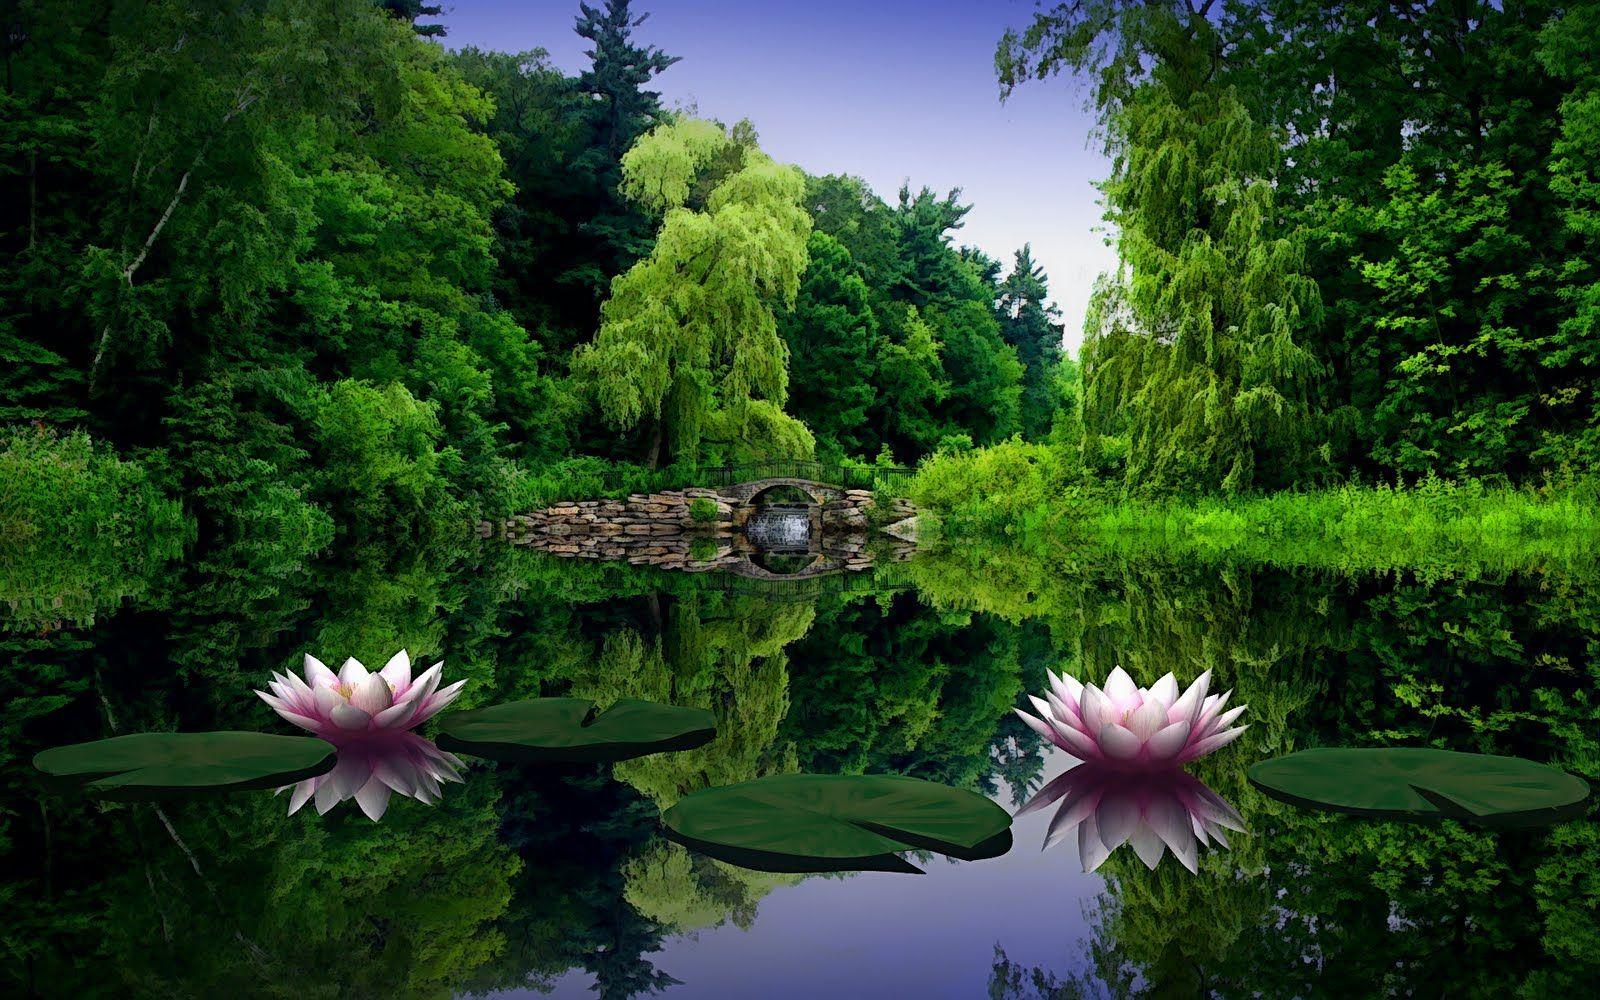 Flower ponds lotus flower meditation garden pinterest lotus flower ponds lotus flower izmirmasajfo